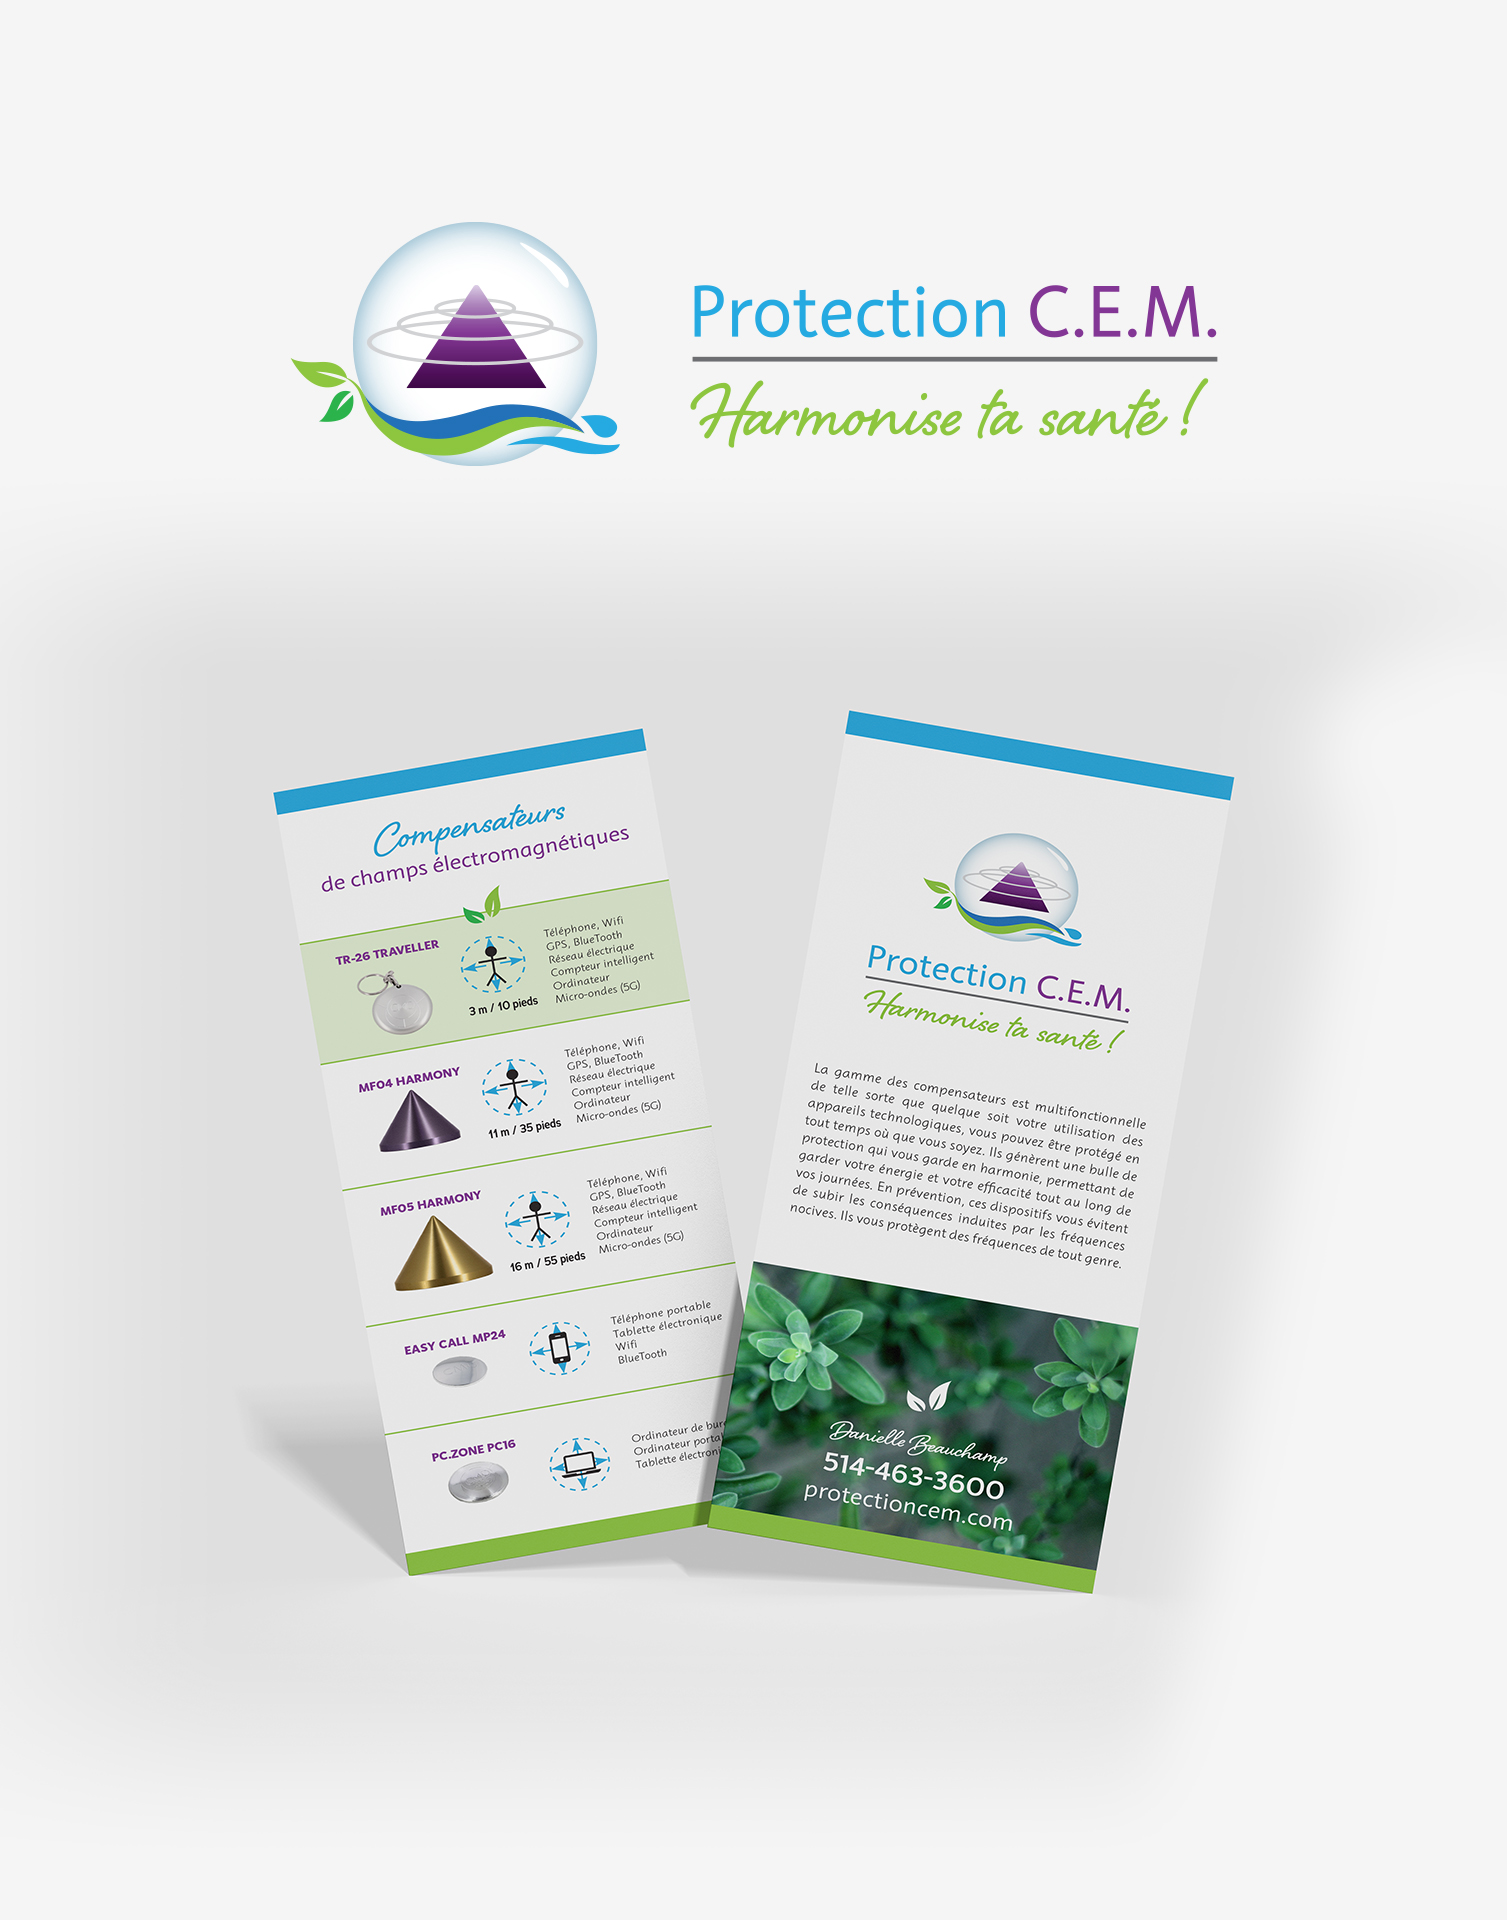 protectioncem